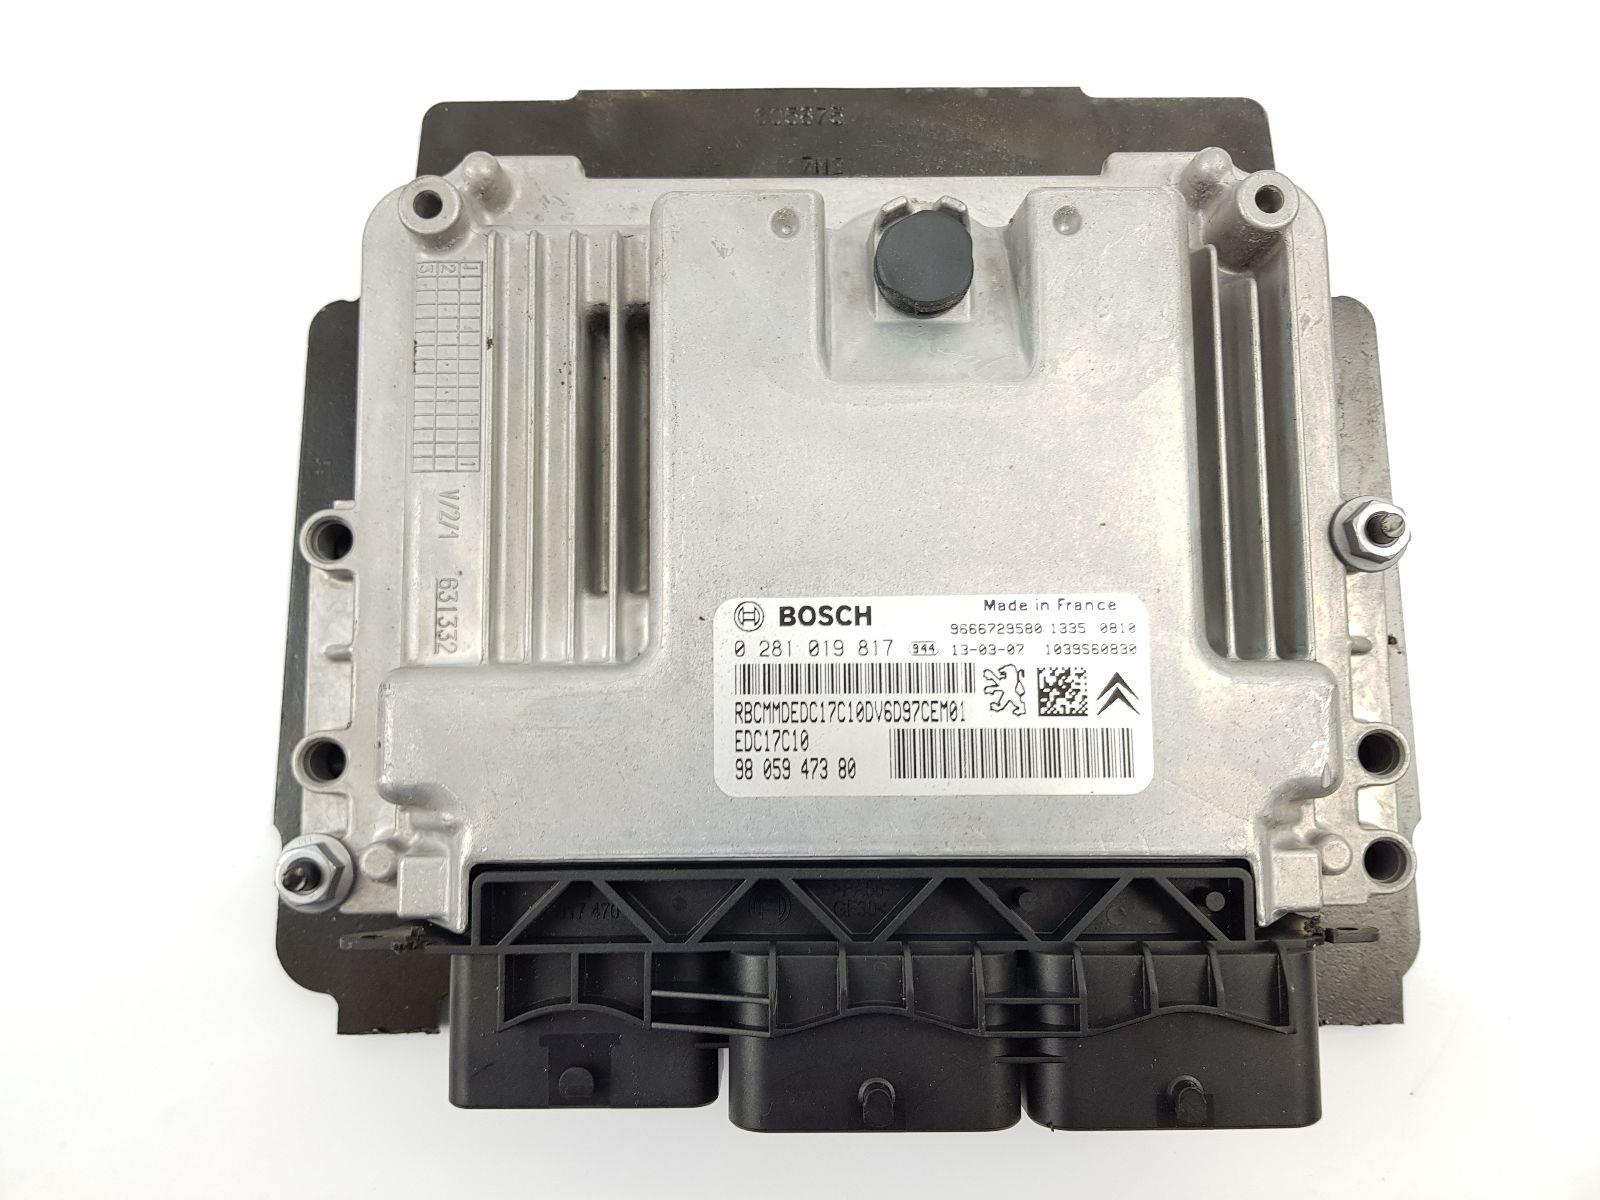 Citroen Berlingo 2008 To 2015 Ecu Engine Diesel Manual For Sale Fuse Box Mk2 Kit Speedo Ignition Key 9666729580